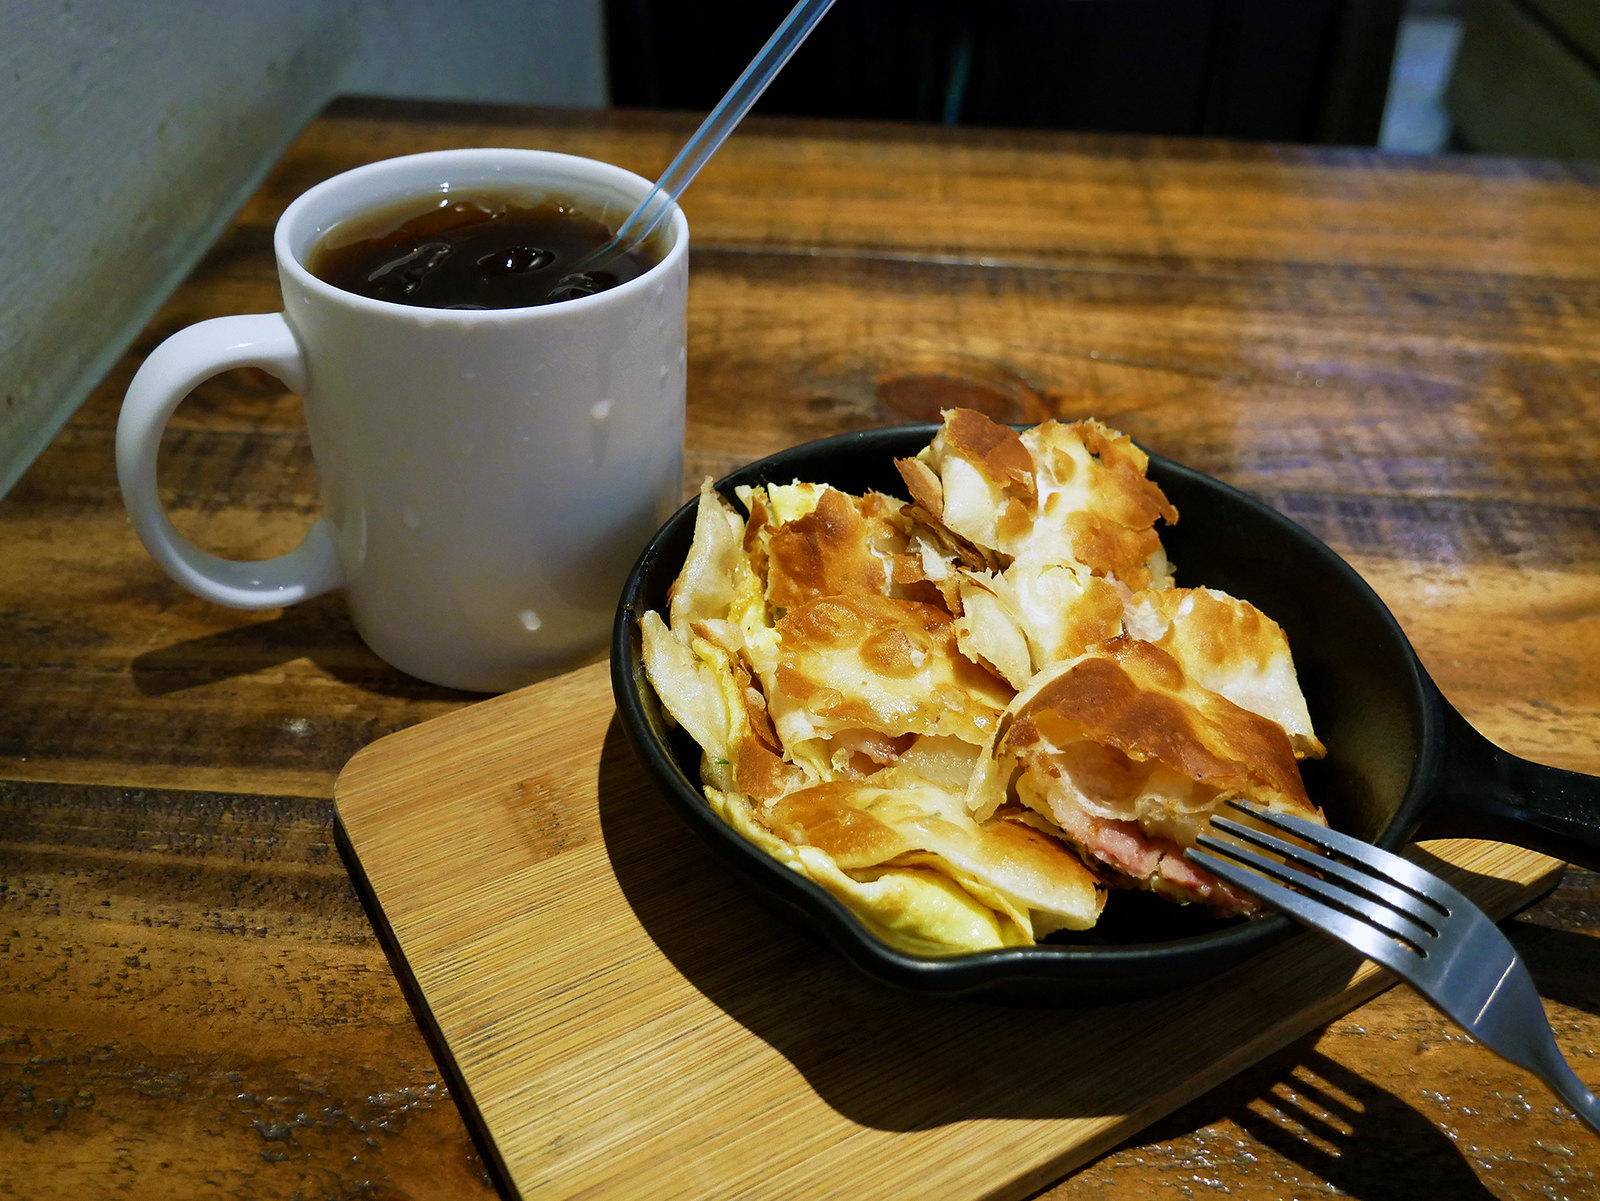 Peggy's Brunch 紅茶 鳳梨培根雙餡蛋餅